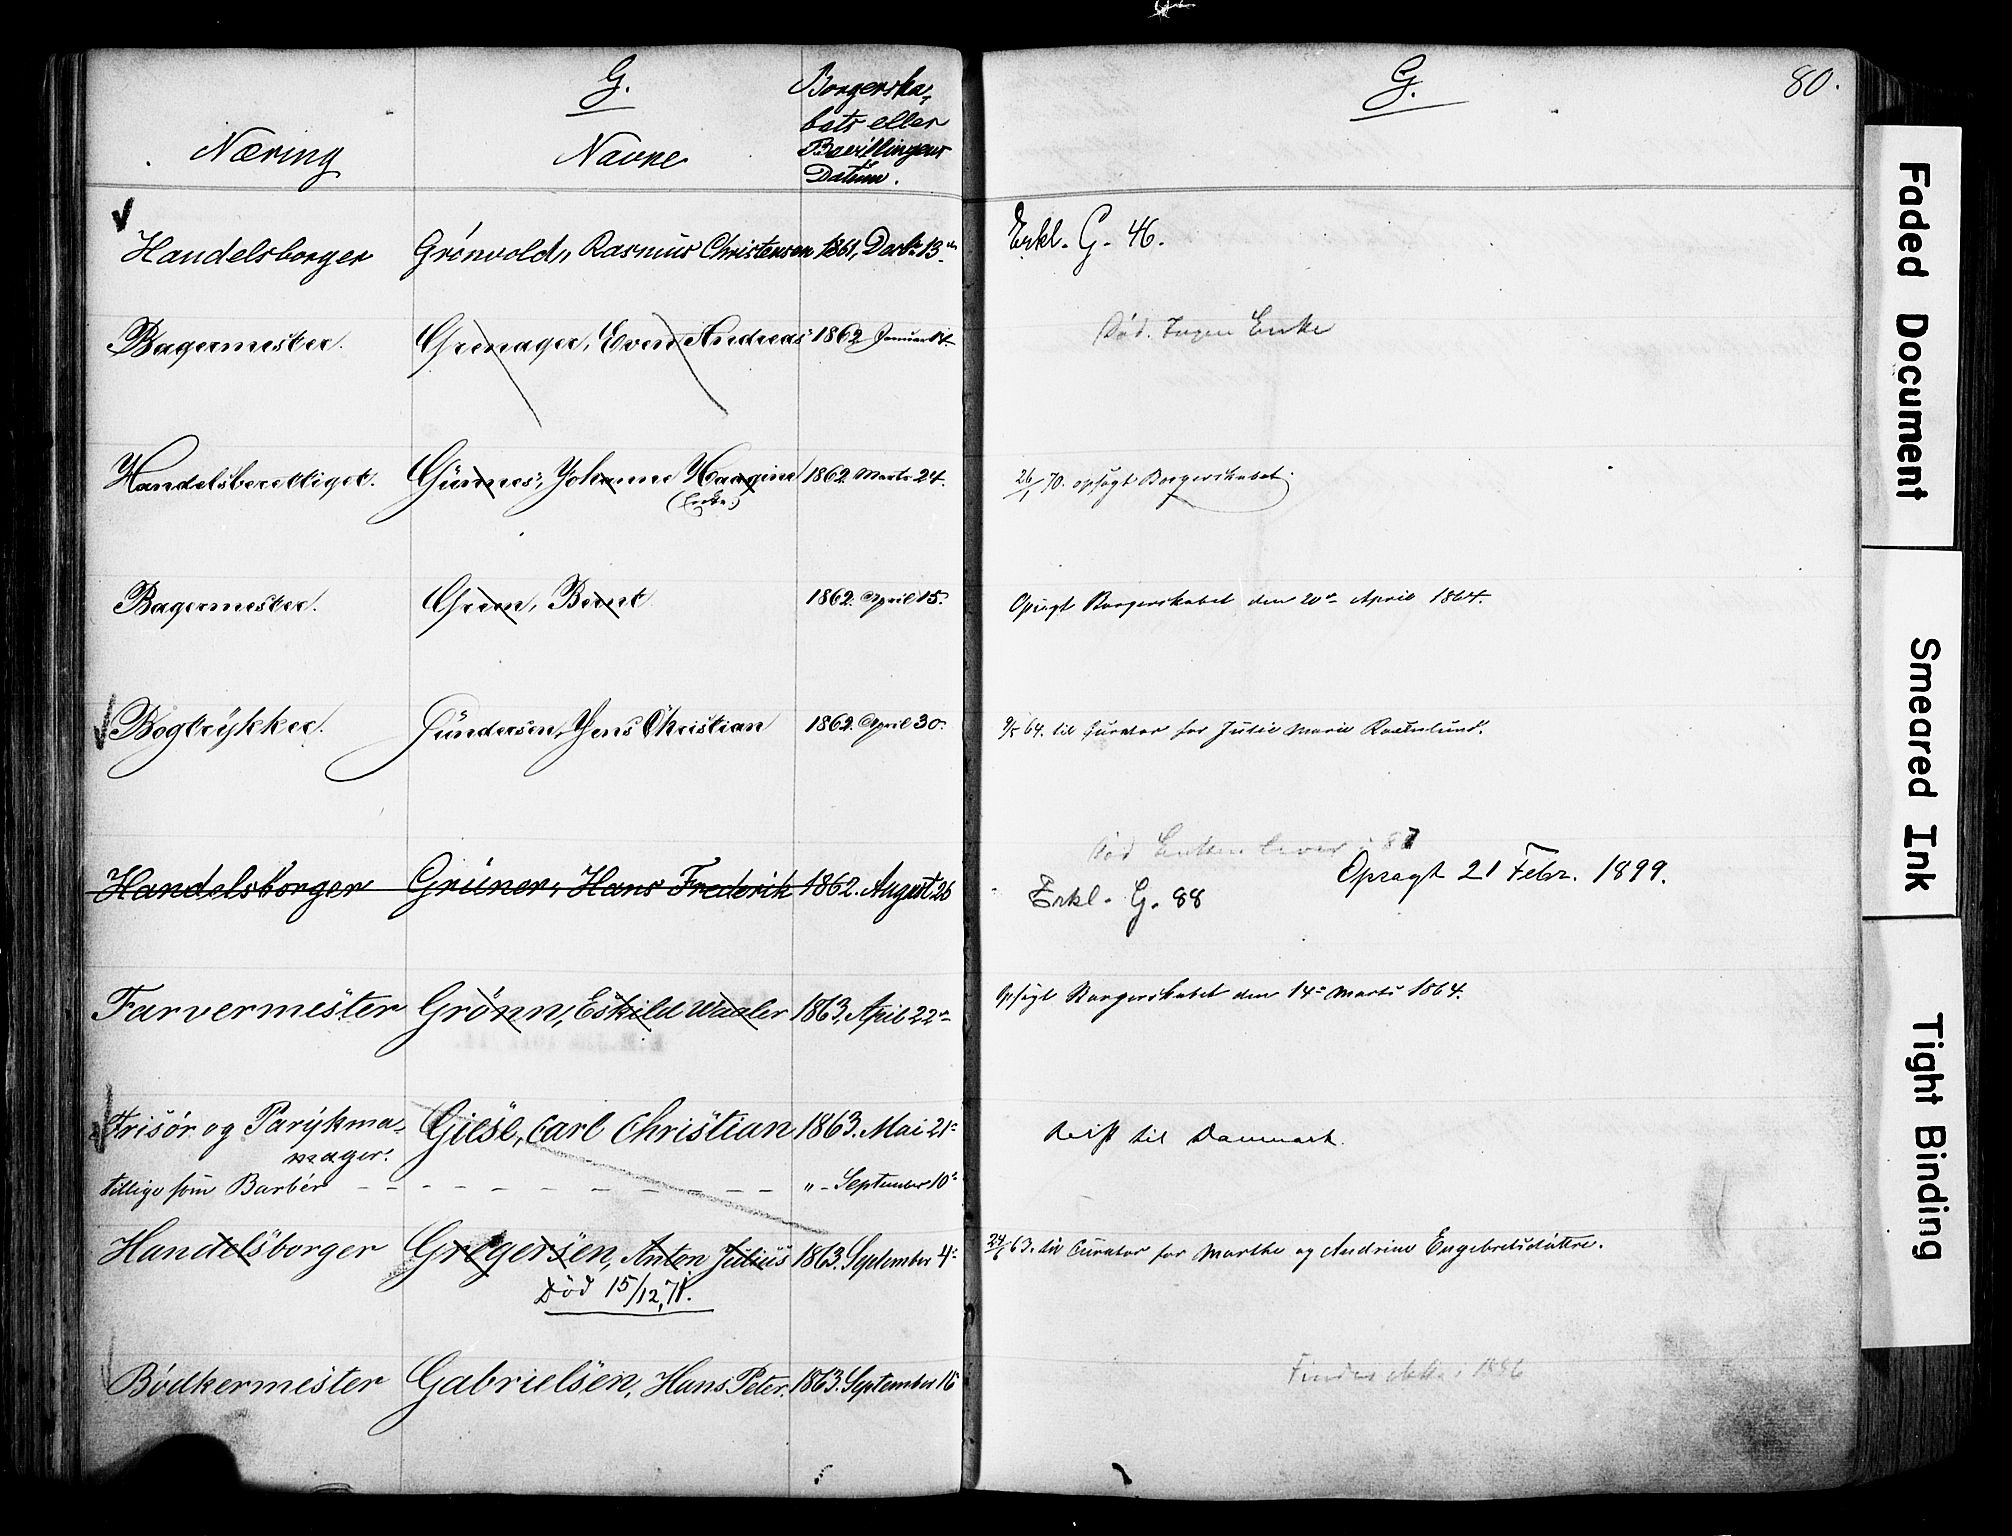 SAO, Kristiania magistrat, F/Fb/L0004: Borgerrulle, 1860-1879, s. 82